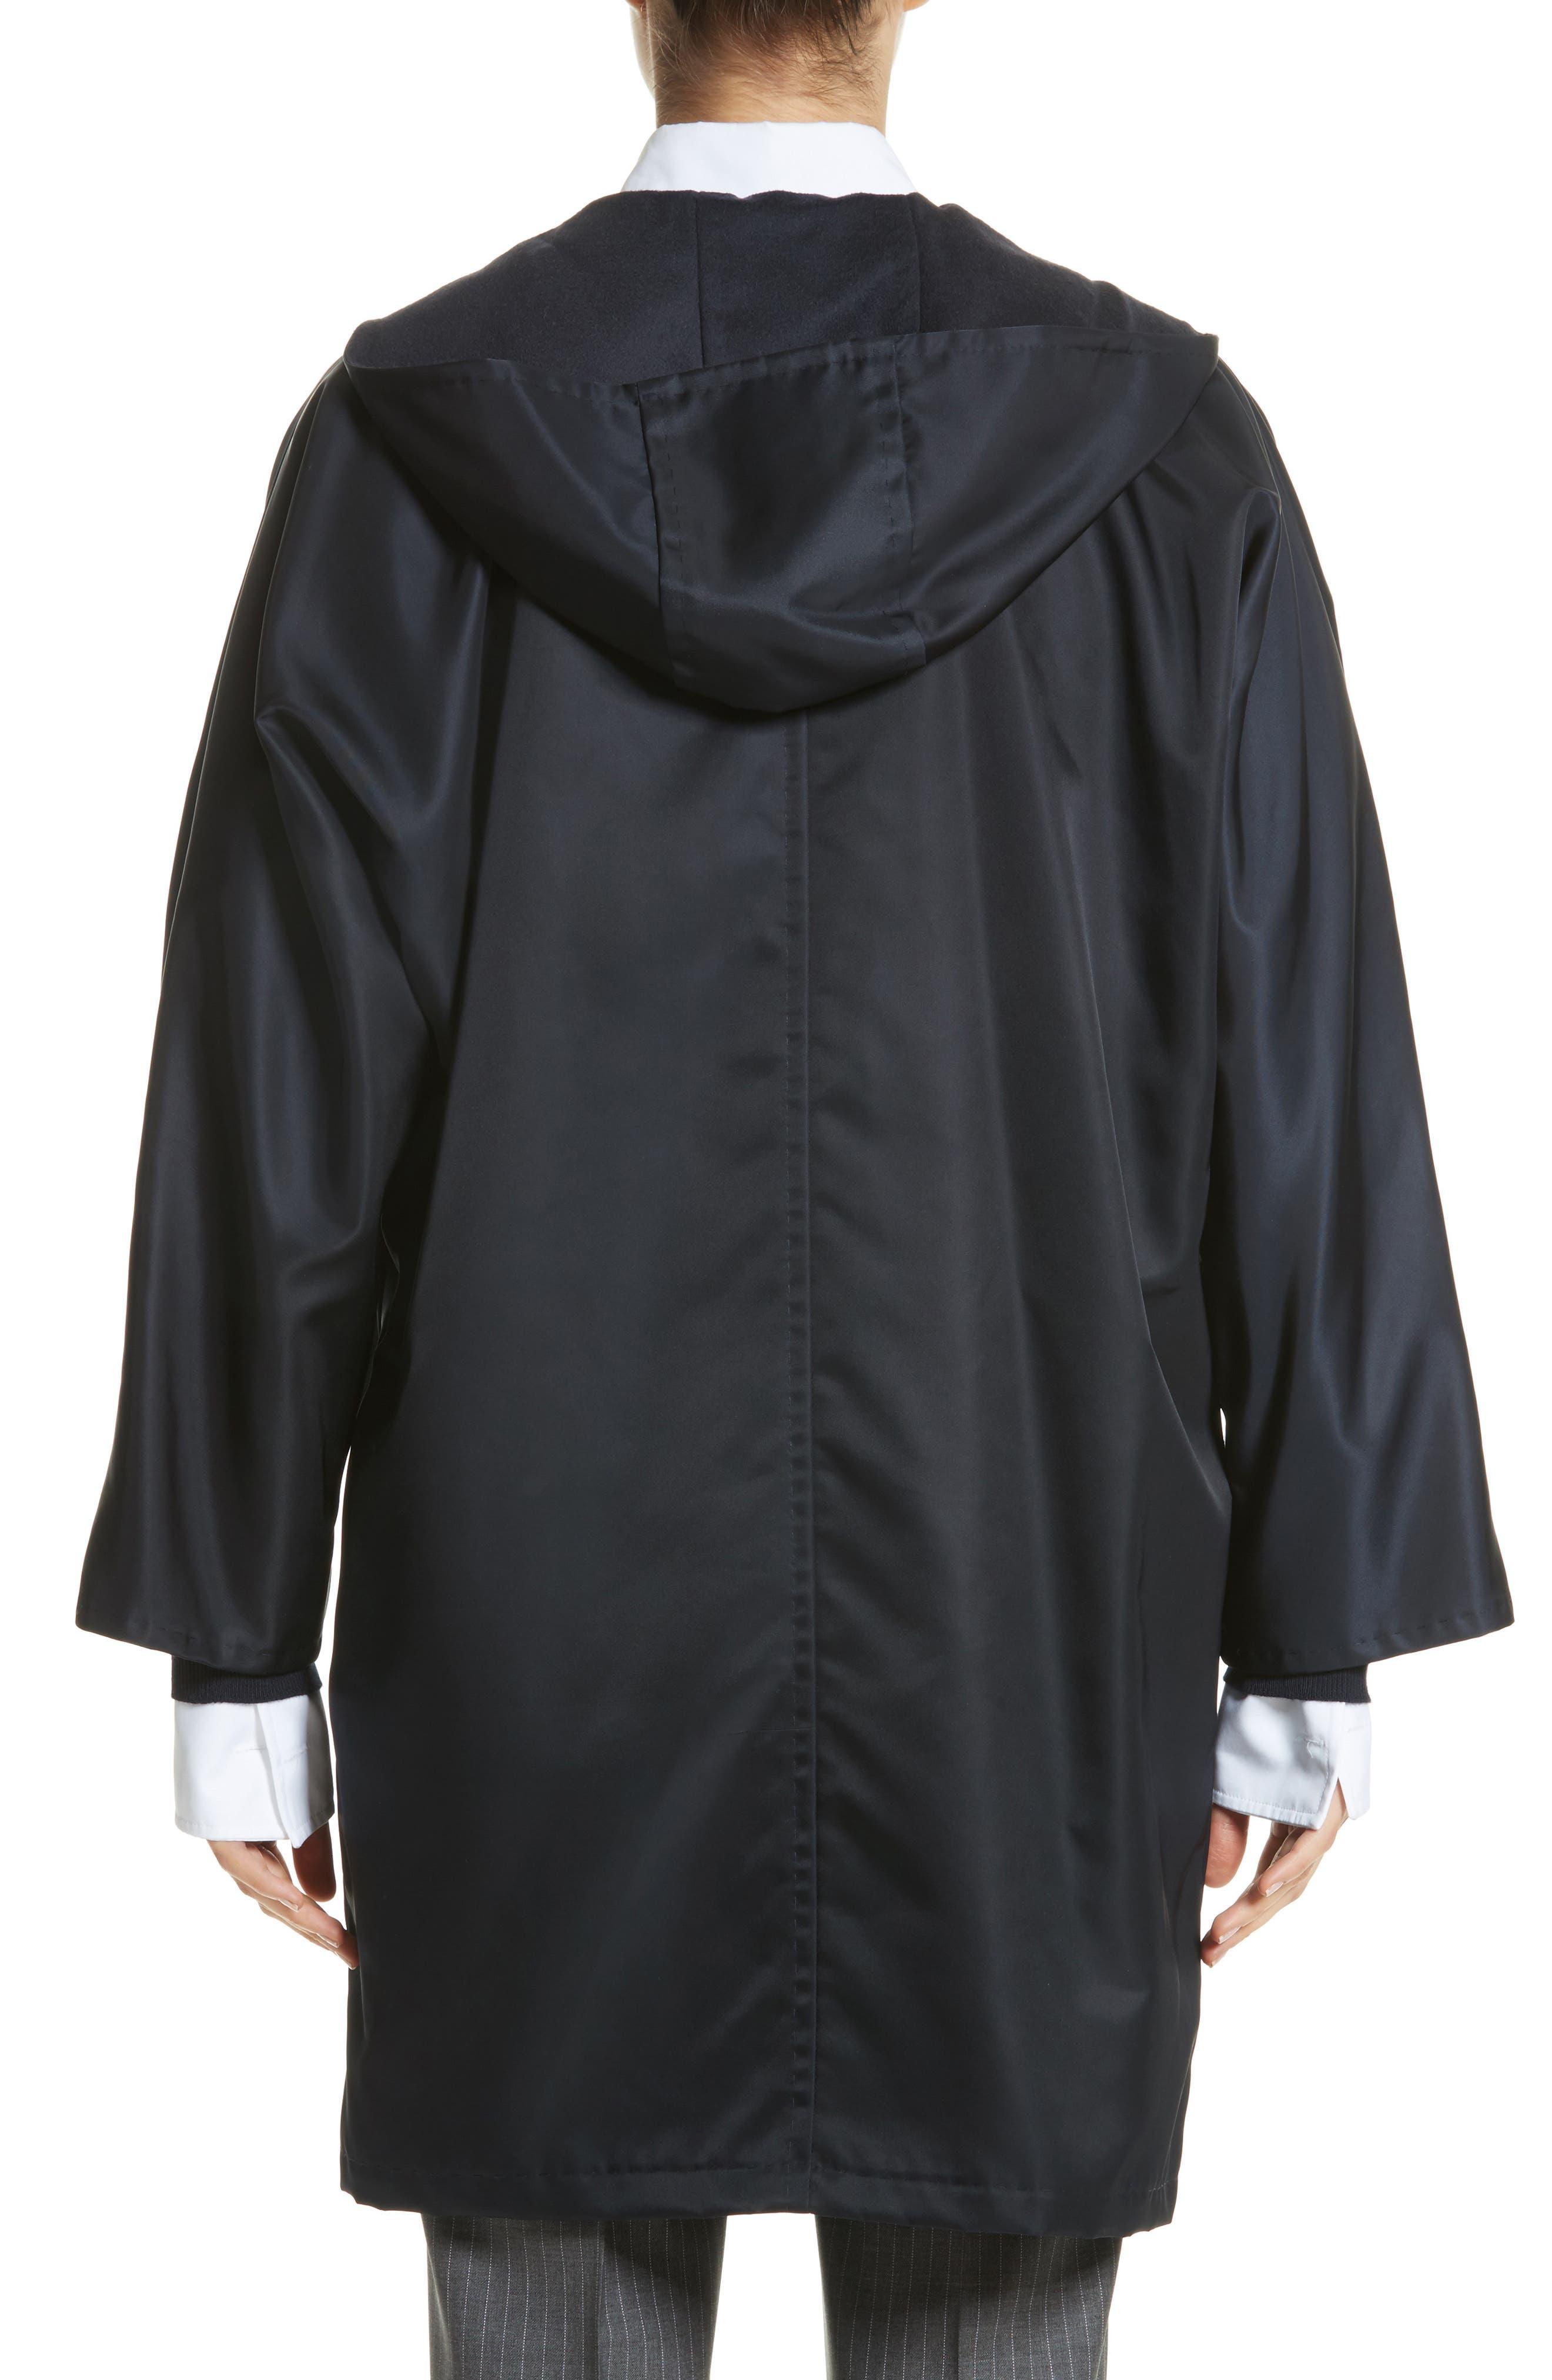 Jacopo Reversible Hooded Coat,                             Alternate thumbnail 3, color,